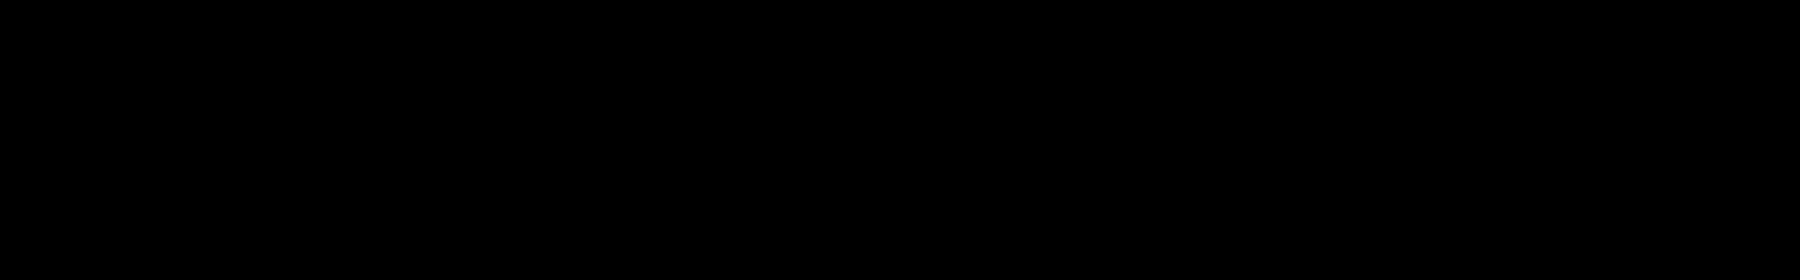 Techno Mole audio waveform